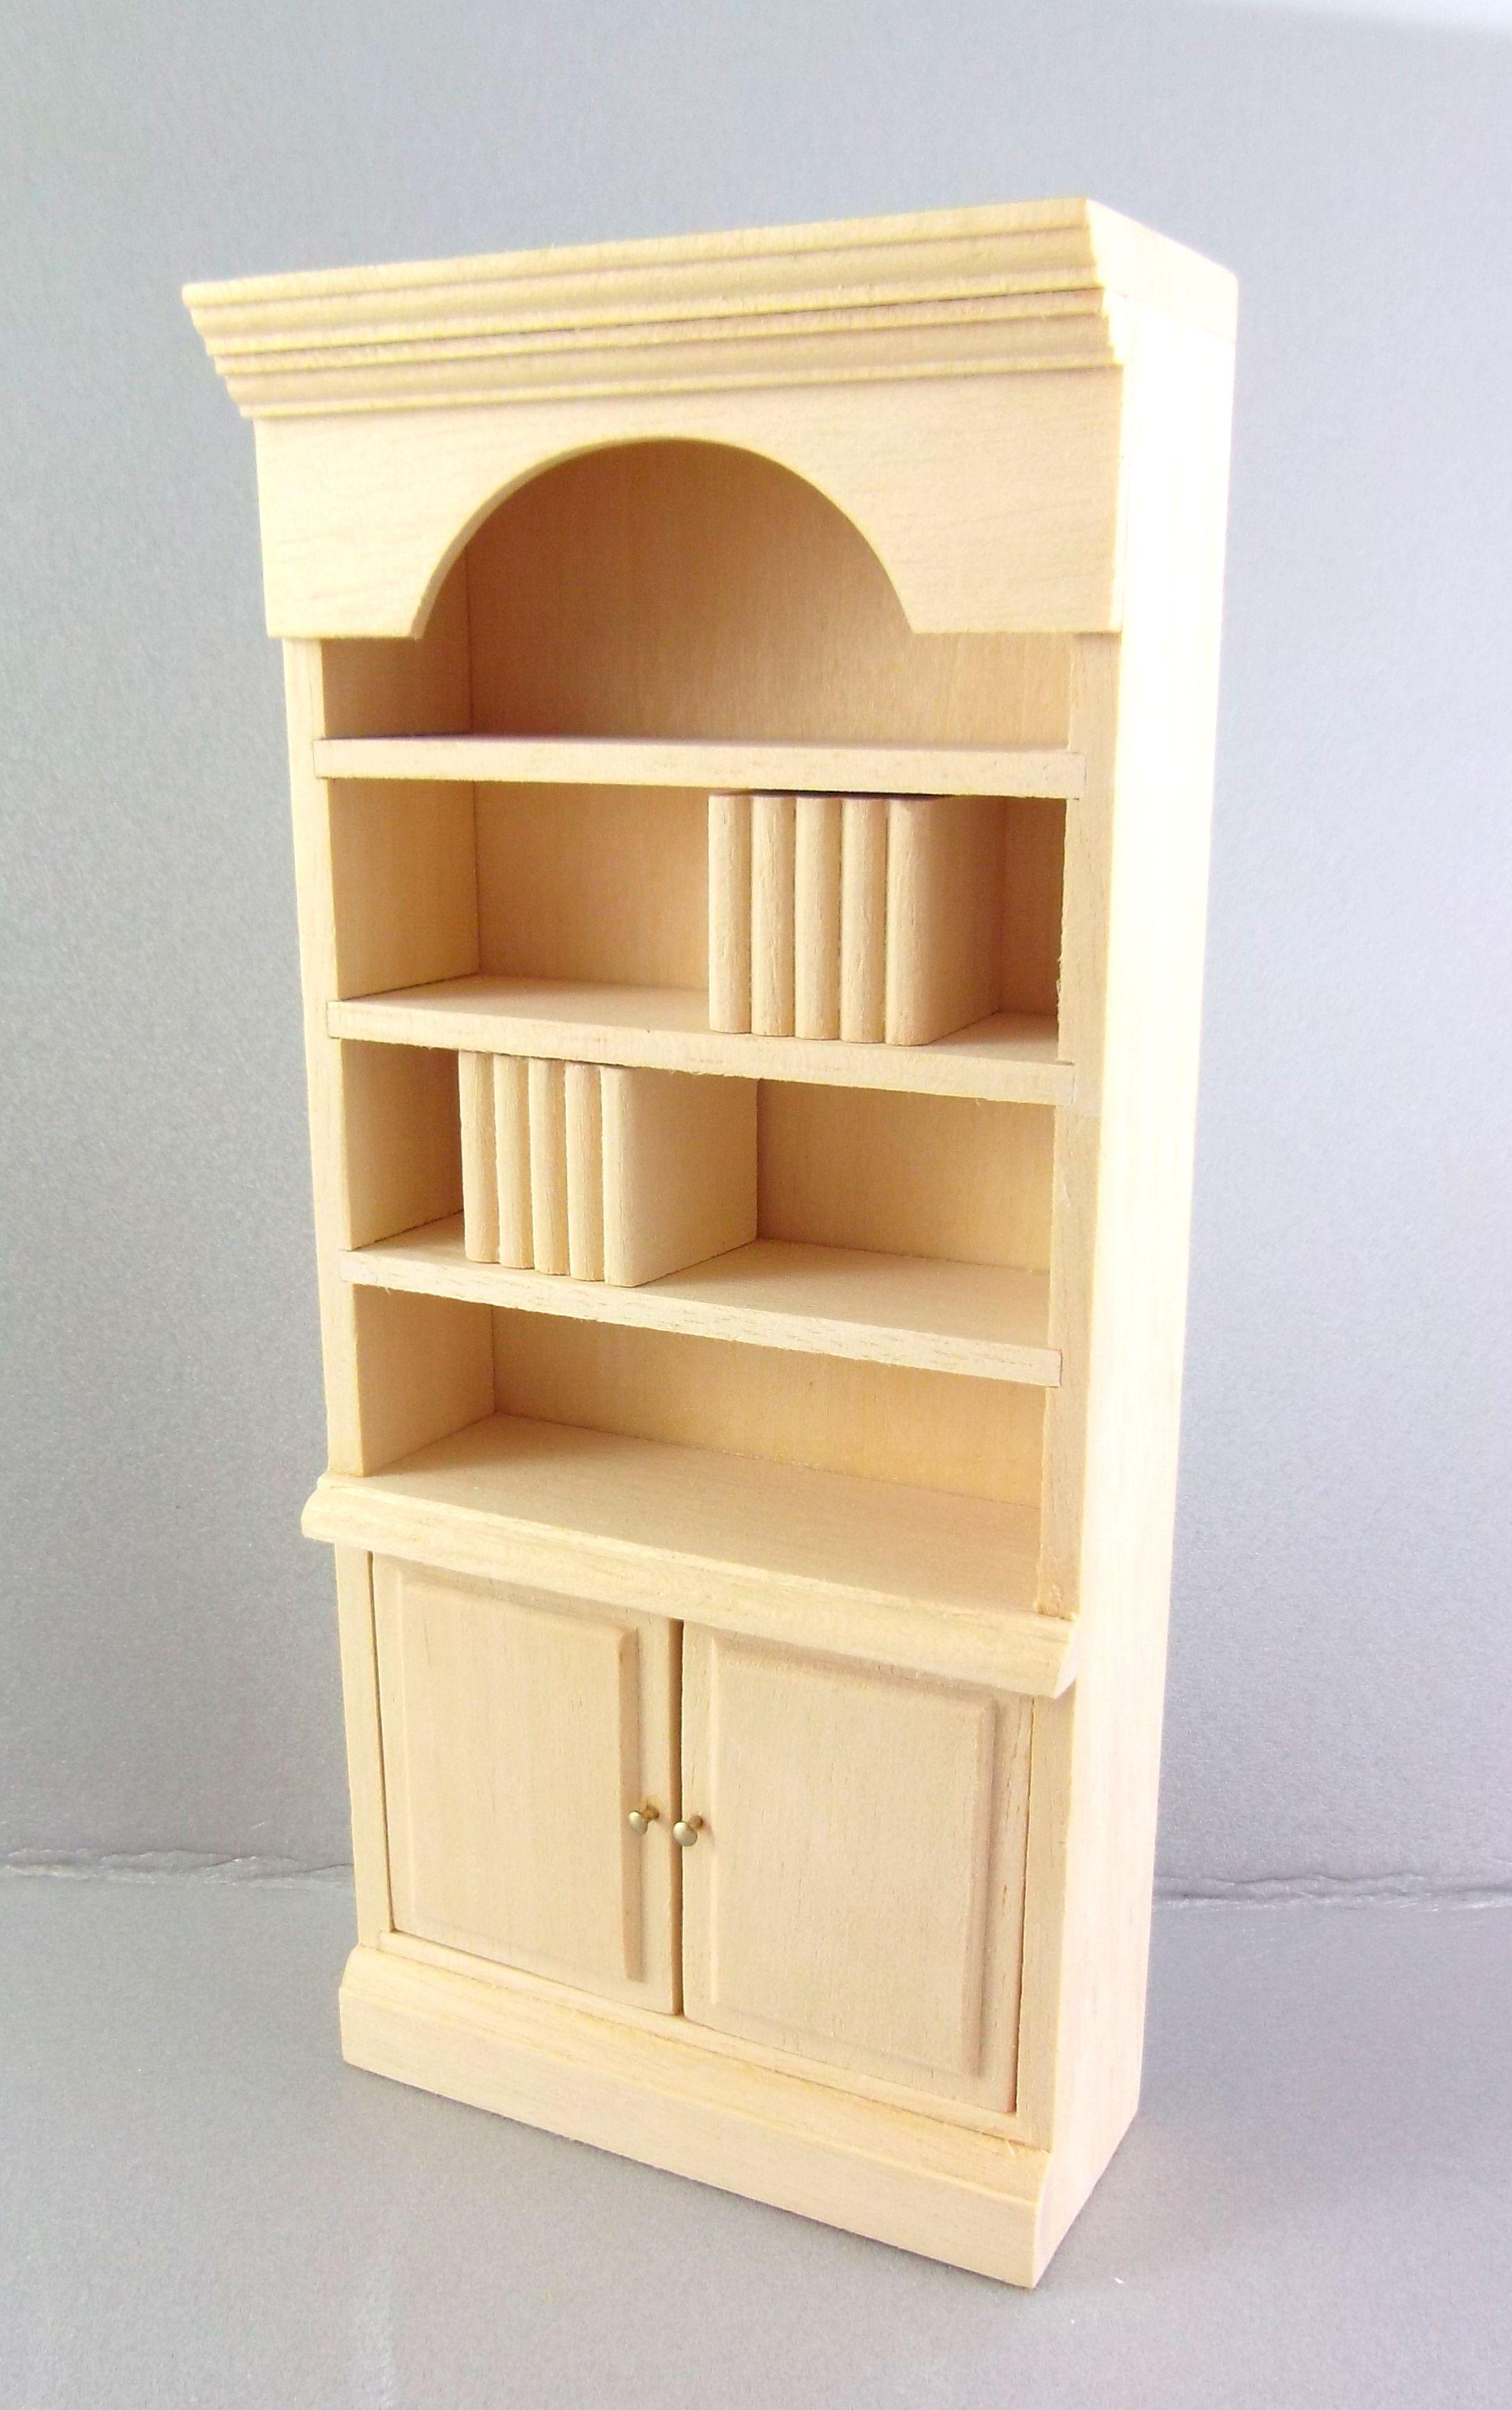 Dolls House Miniature 1:12 Unfinished Furniture Natural Wood Bookcase Shelf  Unit